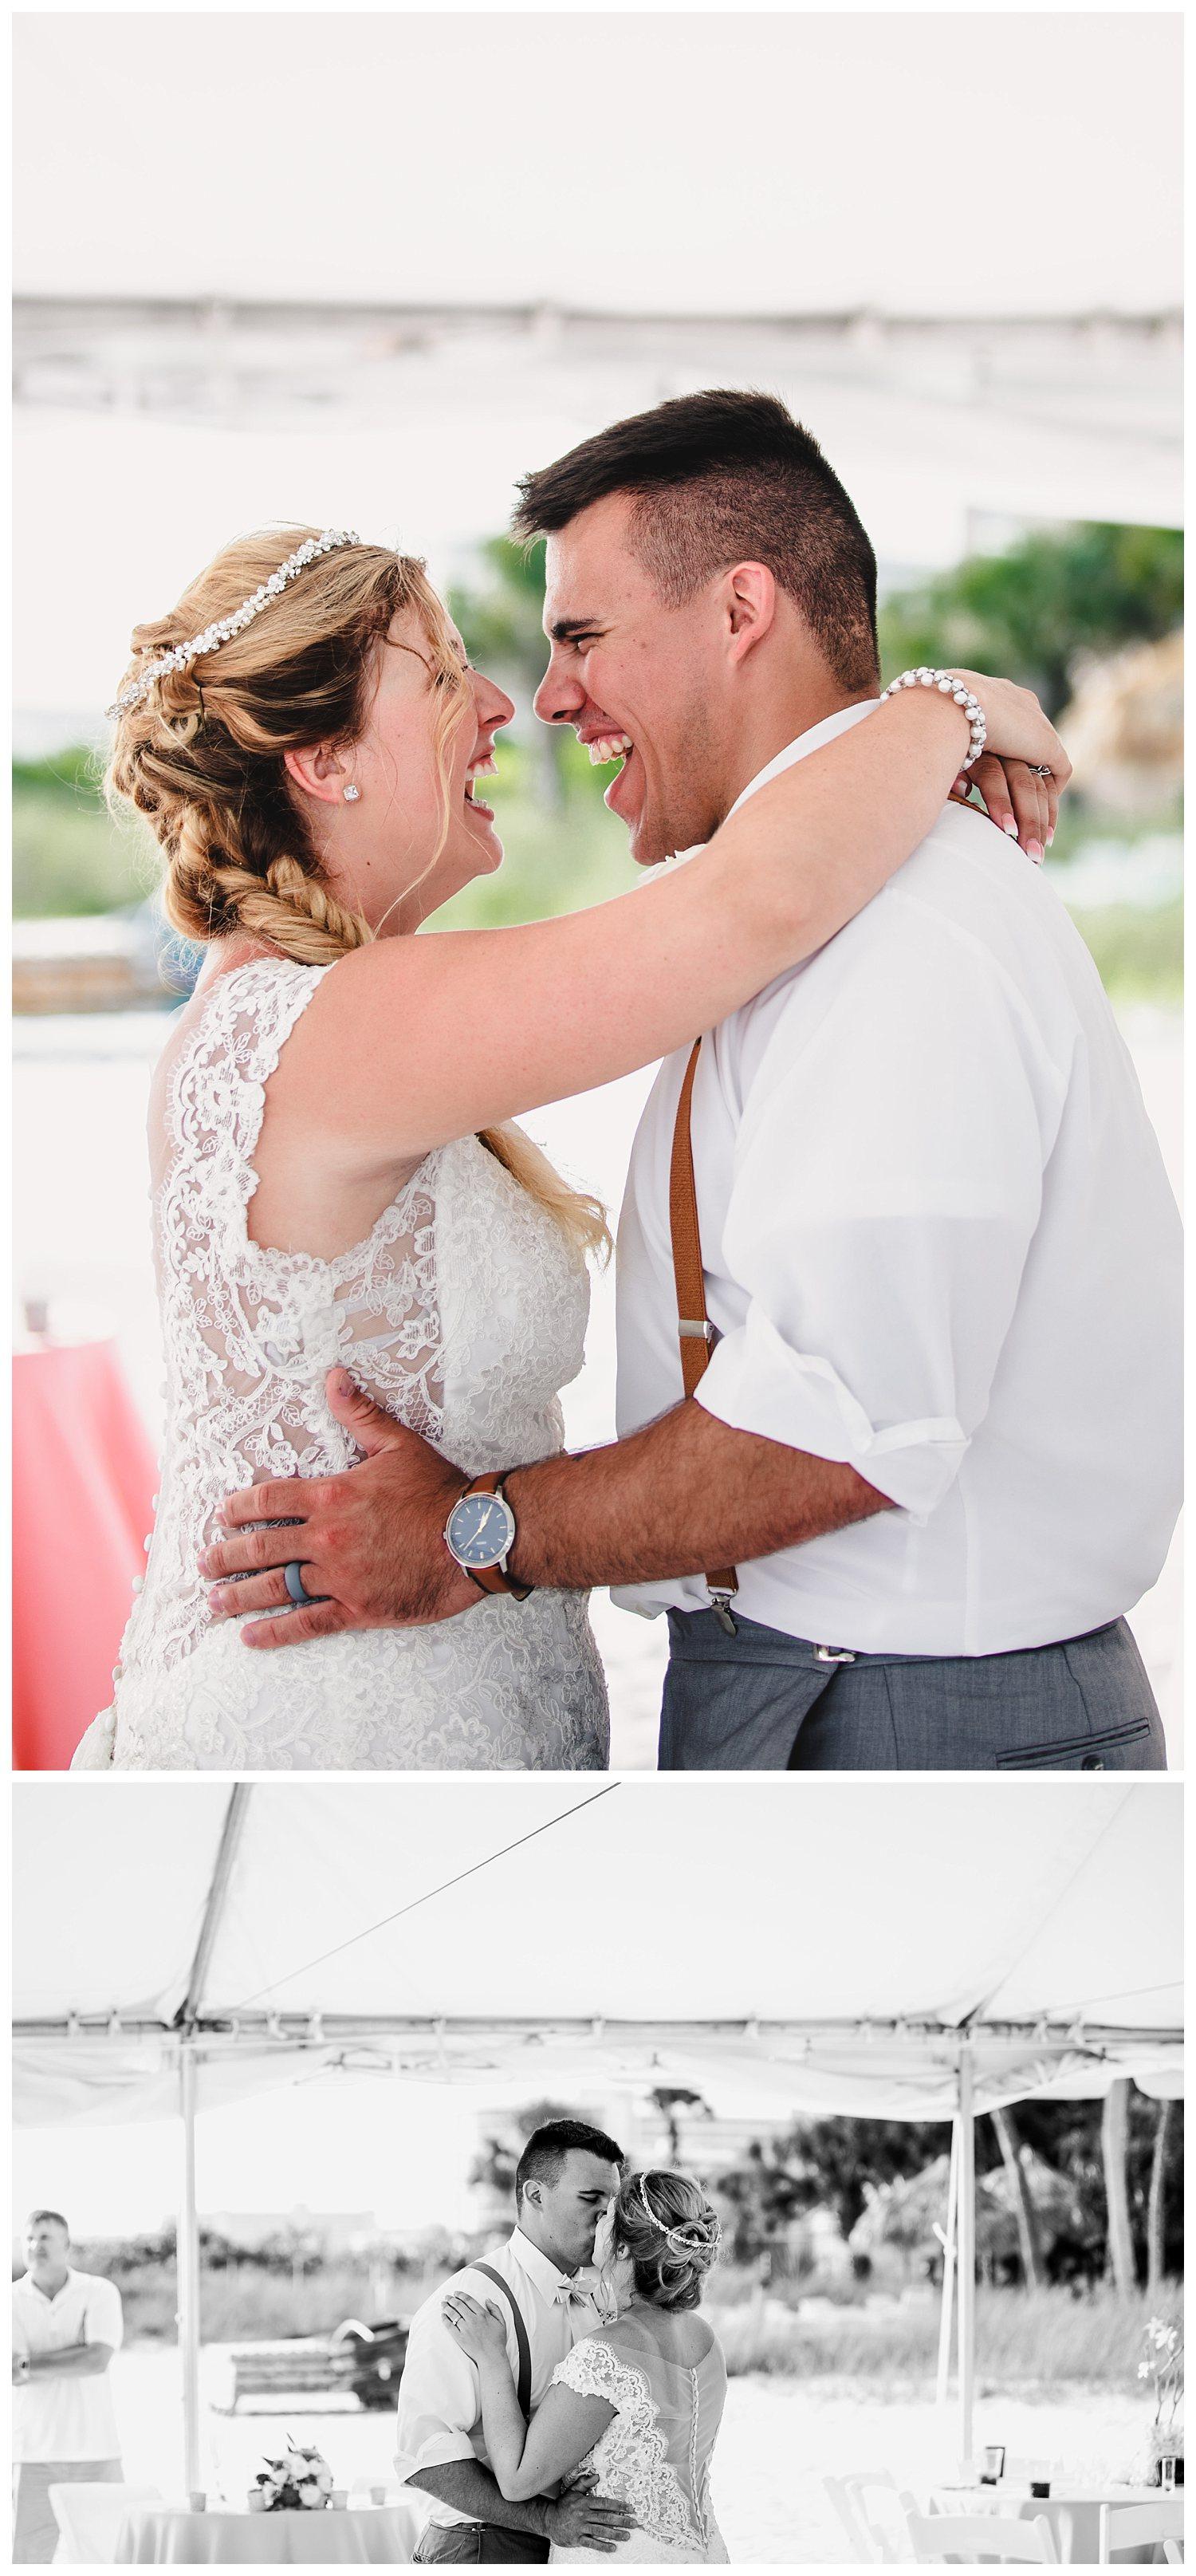 Kelsey_Diane_Photography_Destination_Wedding_Sarasota_Florida_Beach_Wedding_Alex_Austin_0663.jpg